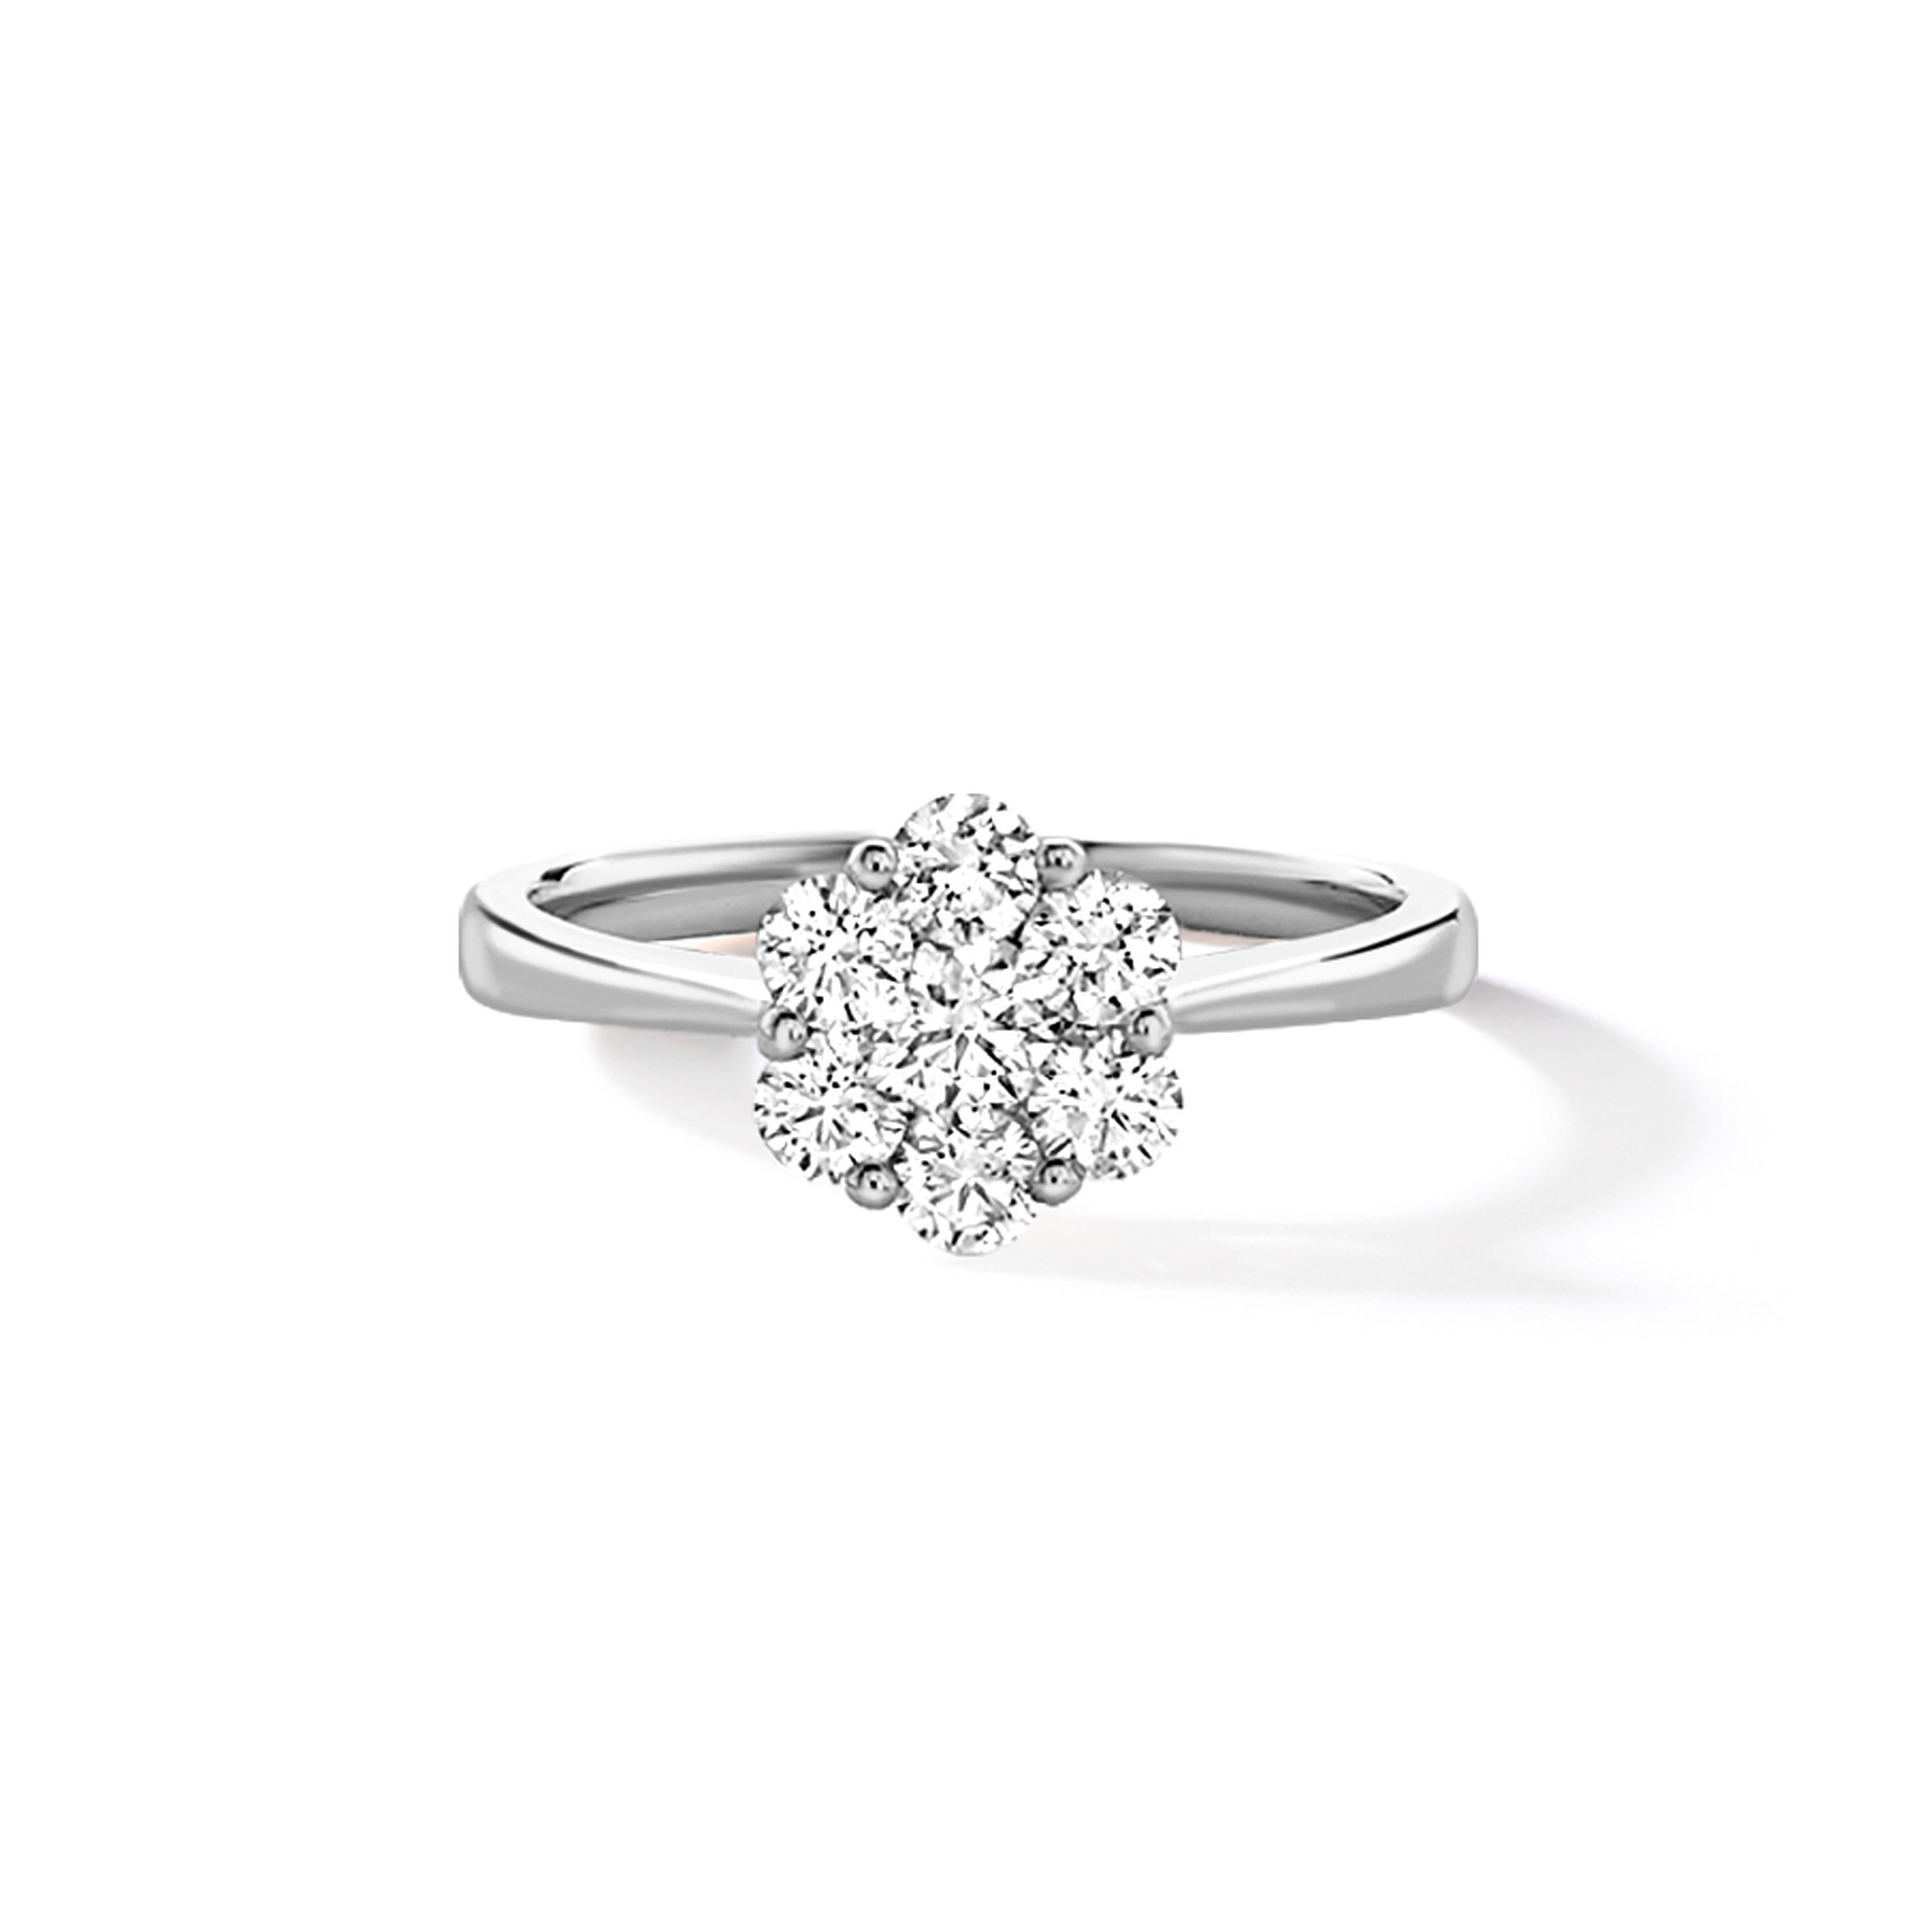 Rudells Daisy 18ct White Gold Diamond Ring 0.75ct